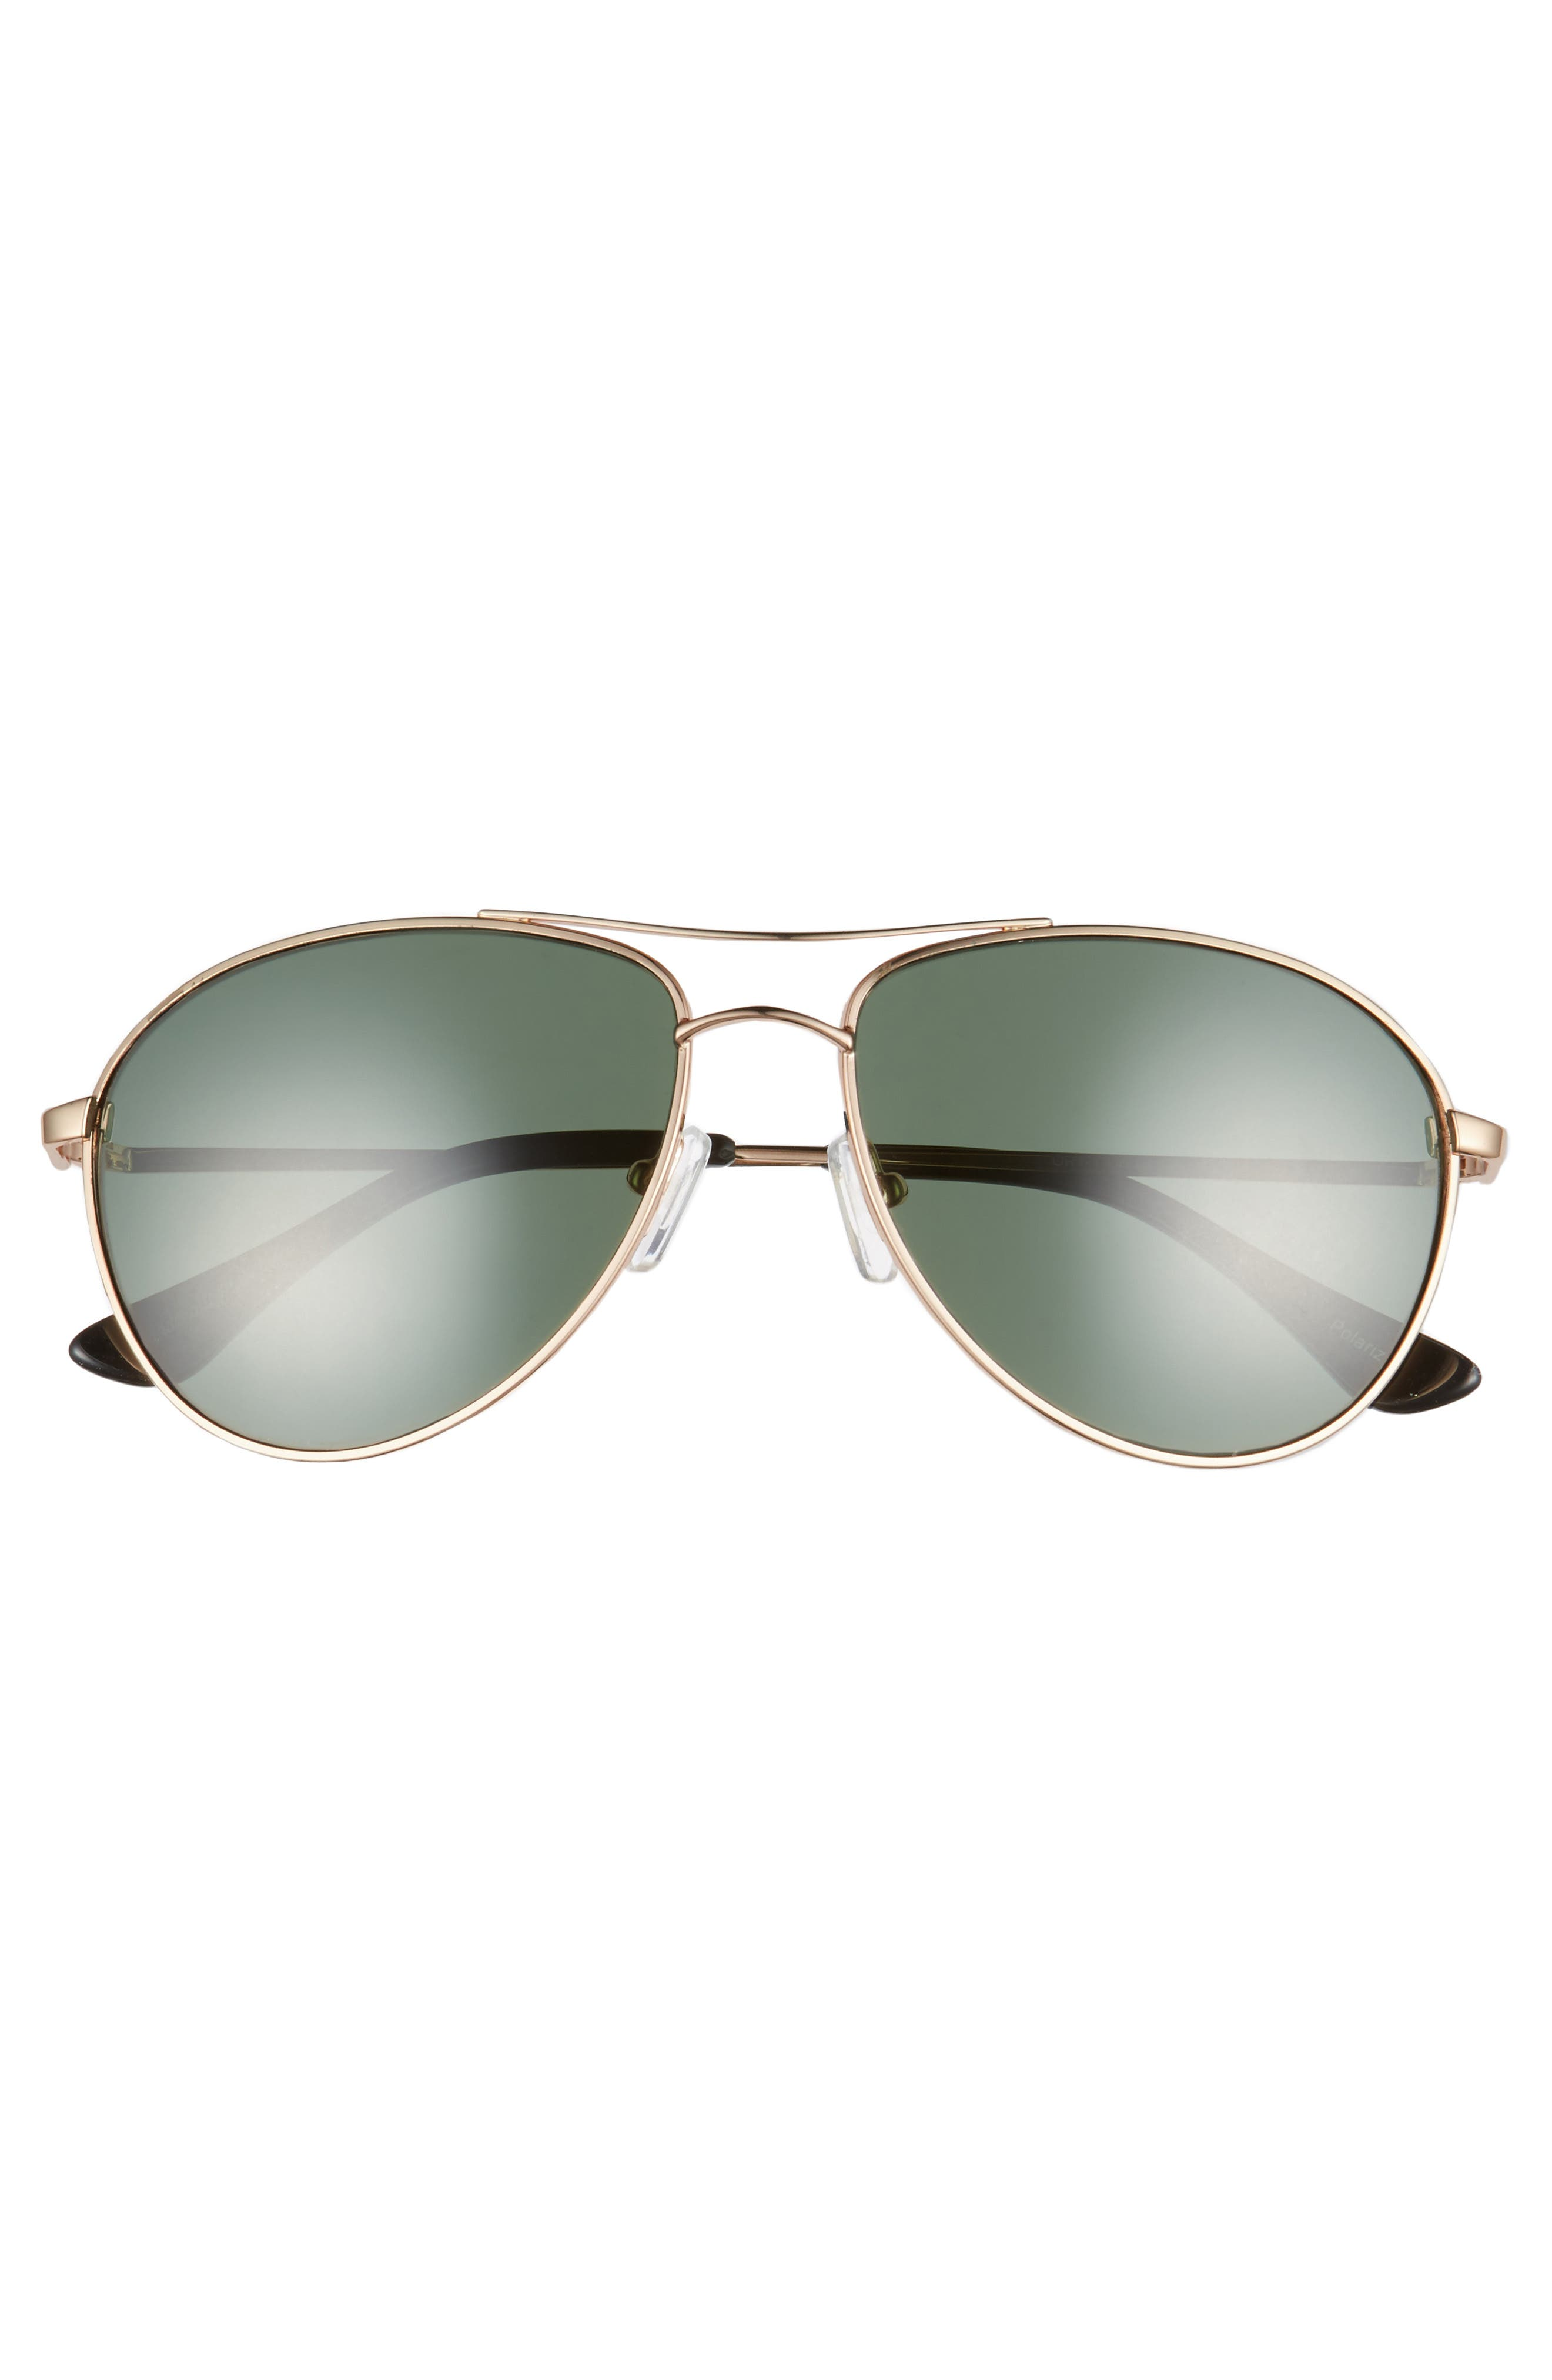 Orville 58mm Polarized Aviator Sunglasses,                             Alternate thumbnail 6, color,